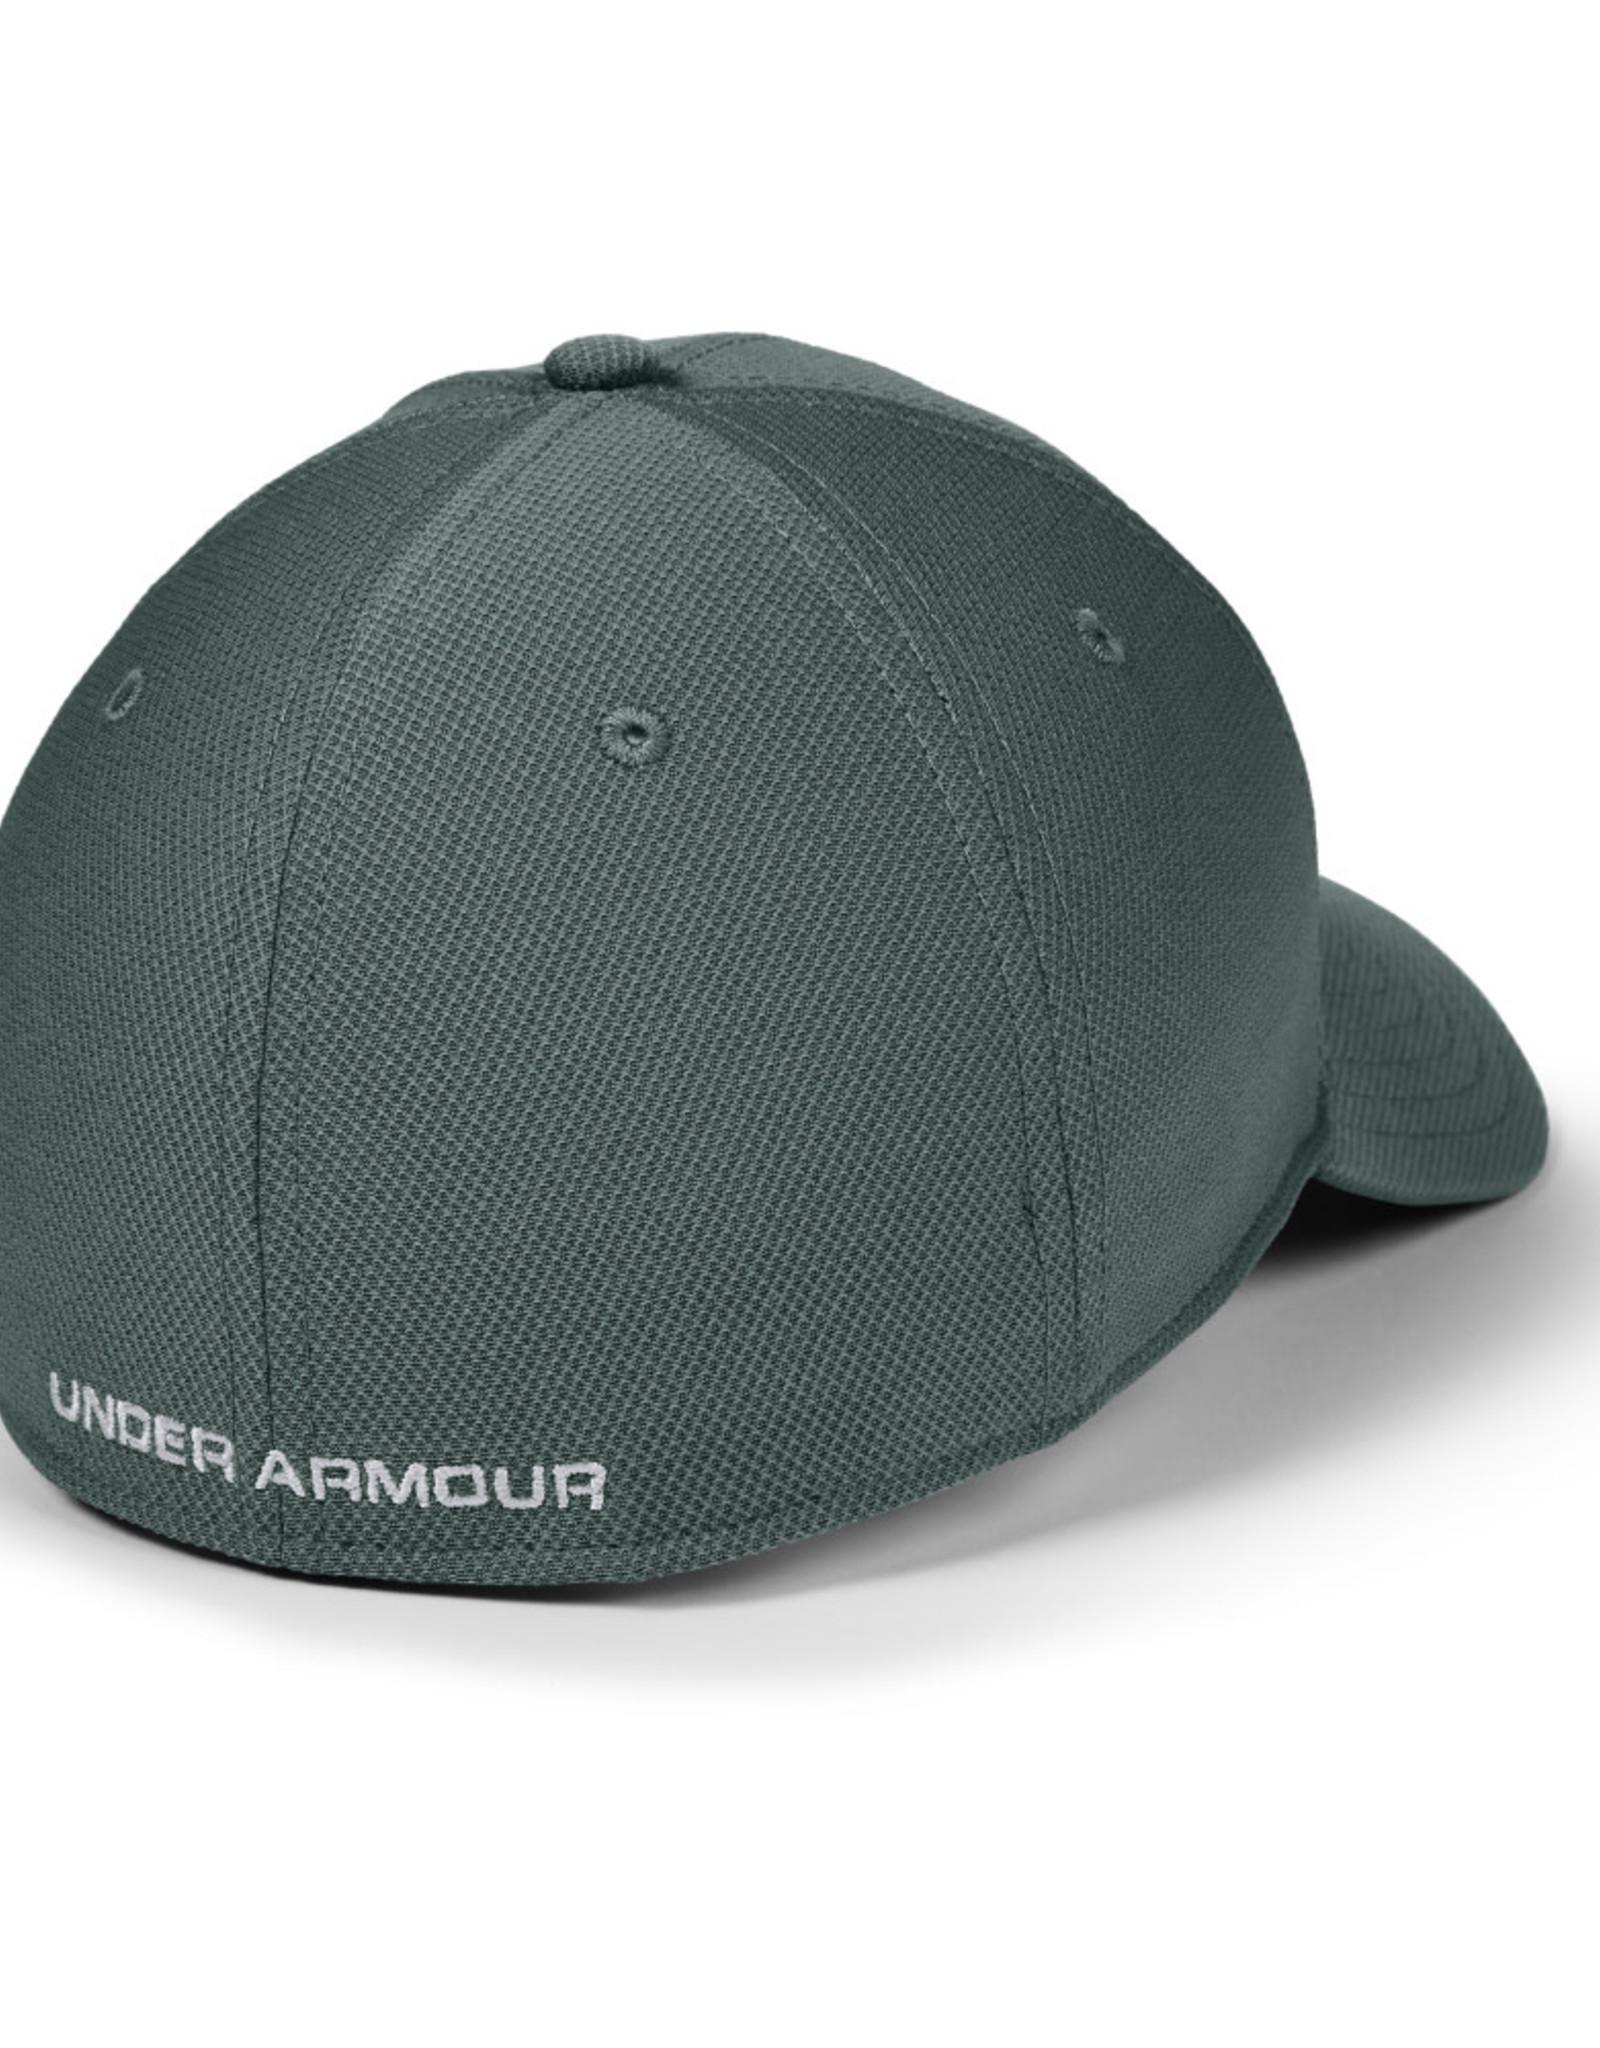 Under Armour UA Men's Blitzing 3.0 Cap - Lichen Blue-Lichen Blue-Halo Gray